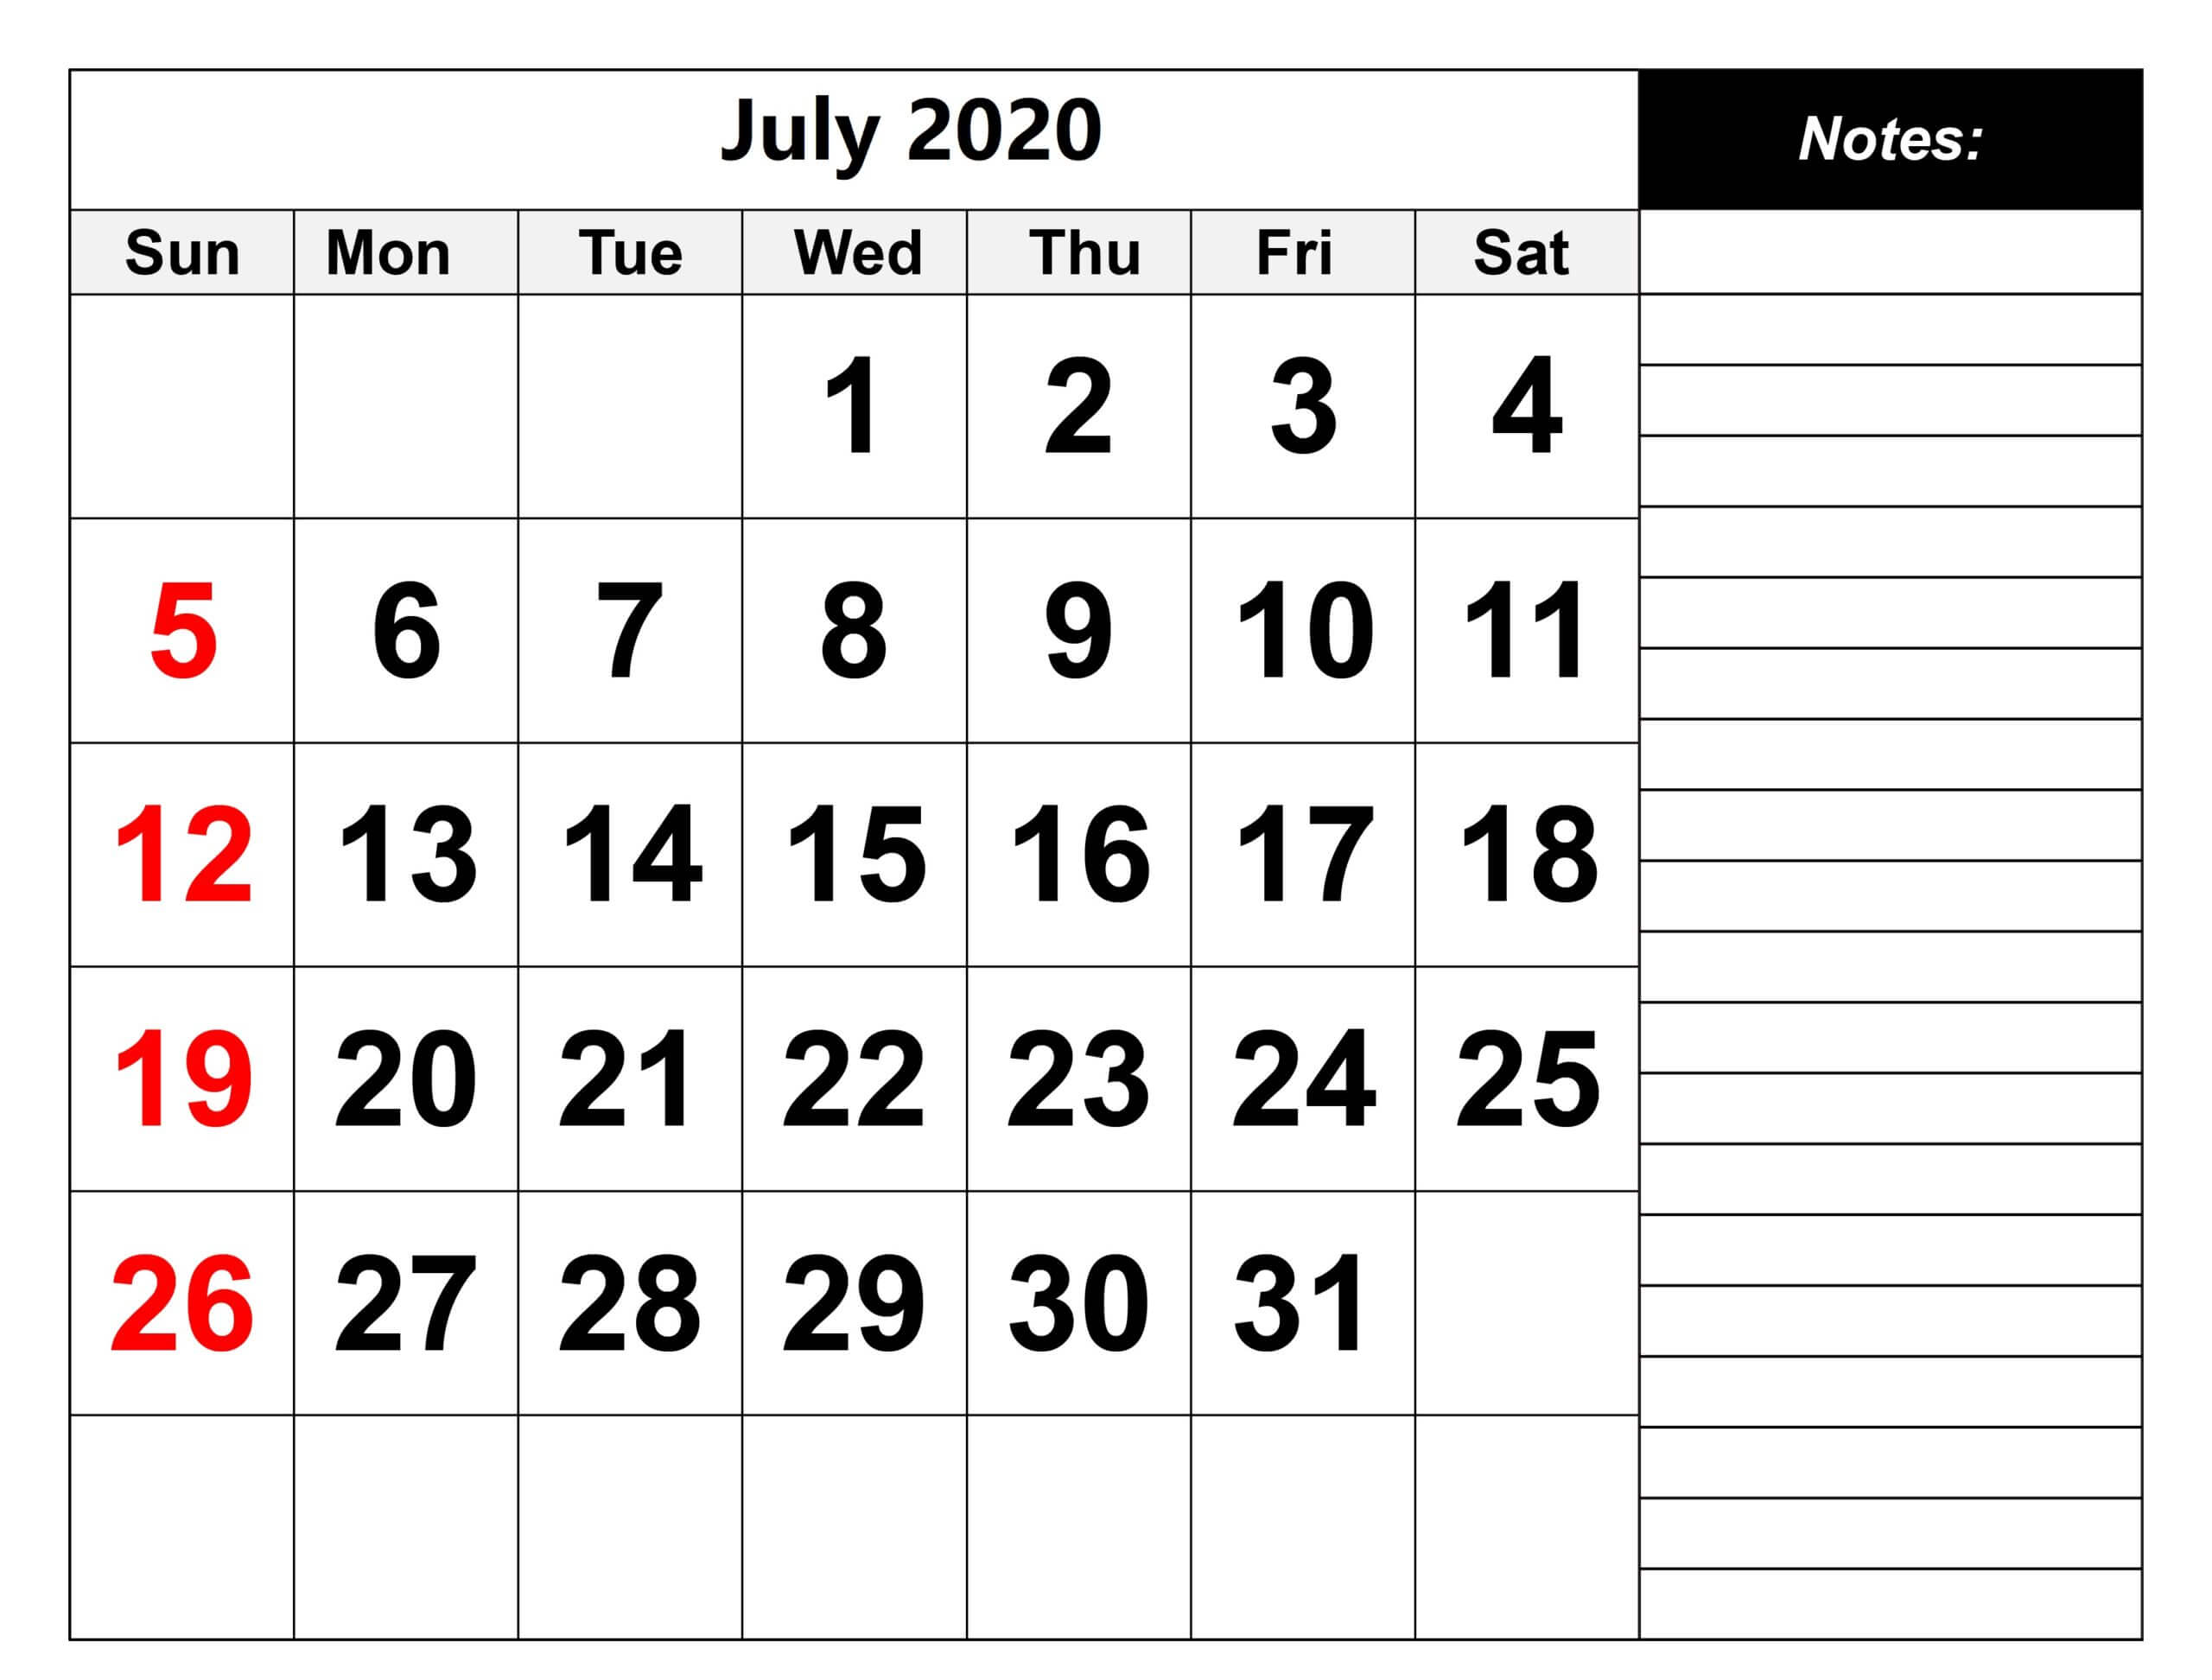 July Calendar 2020 Template download